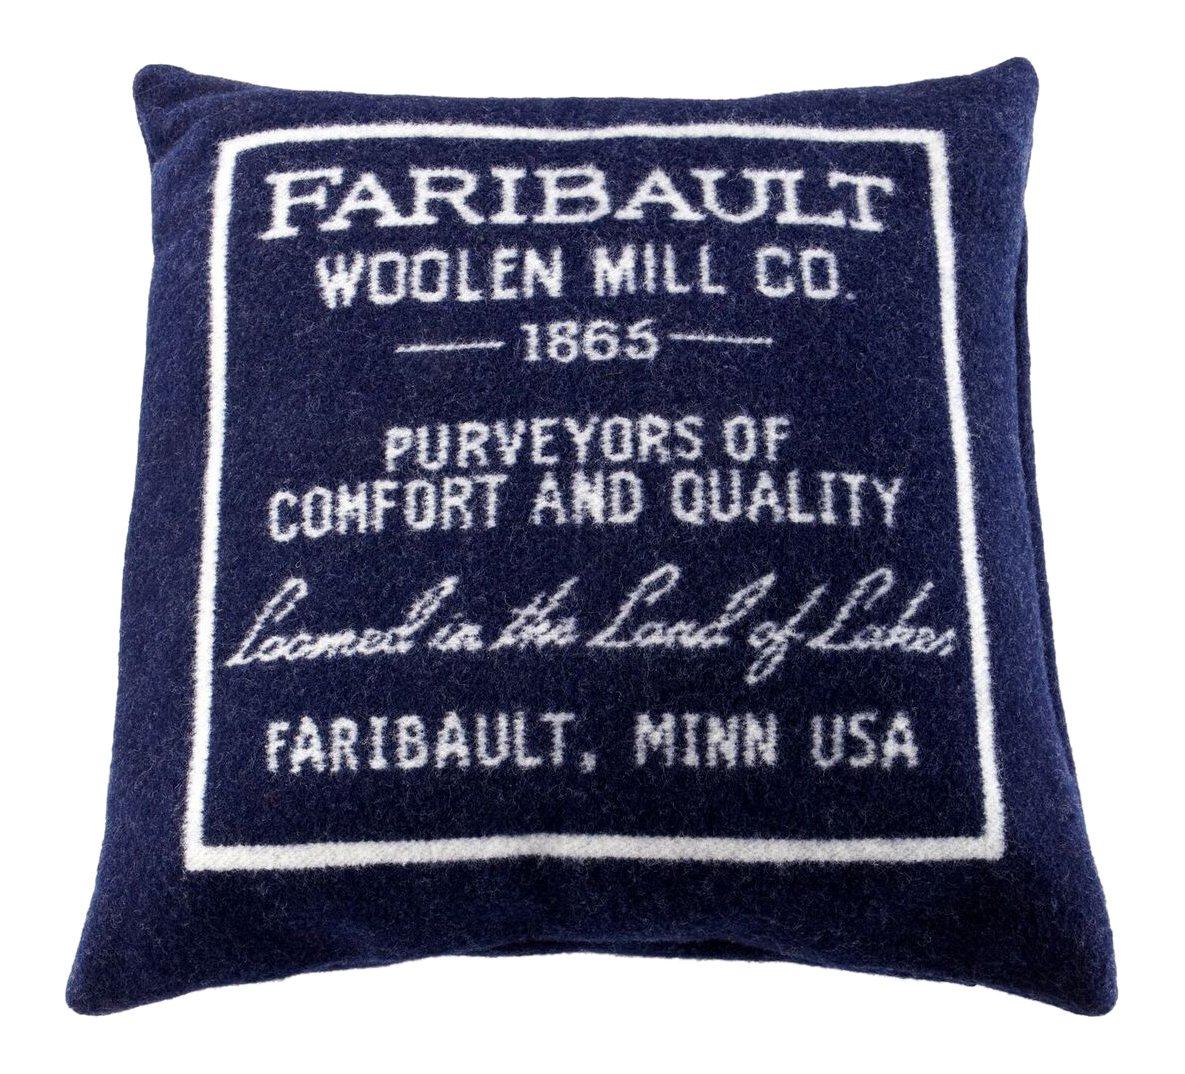 Faribault Woolen Mill Logo Pillow, Navy